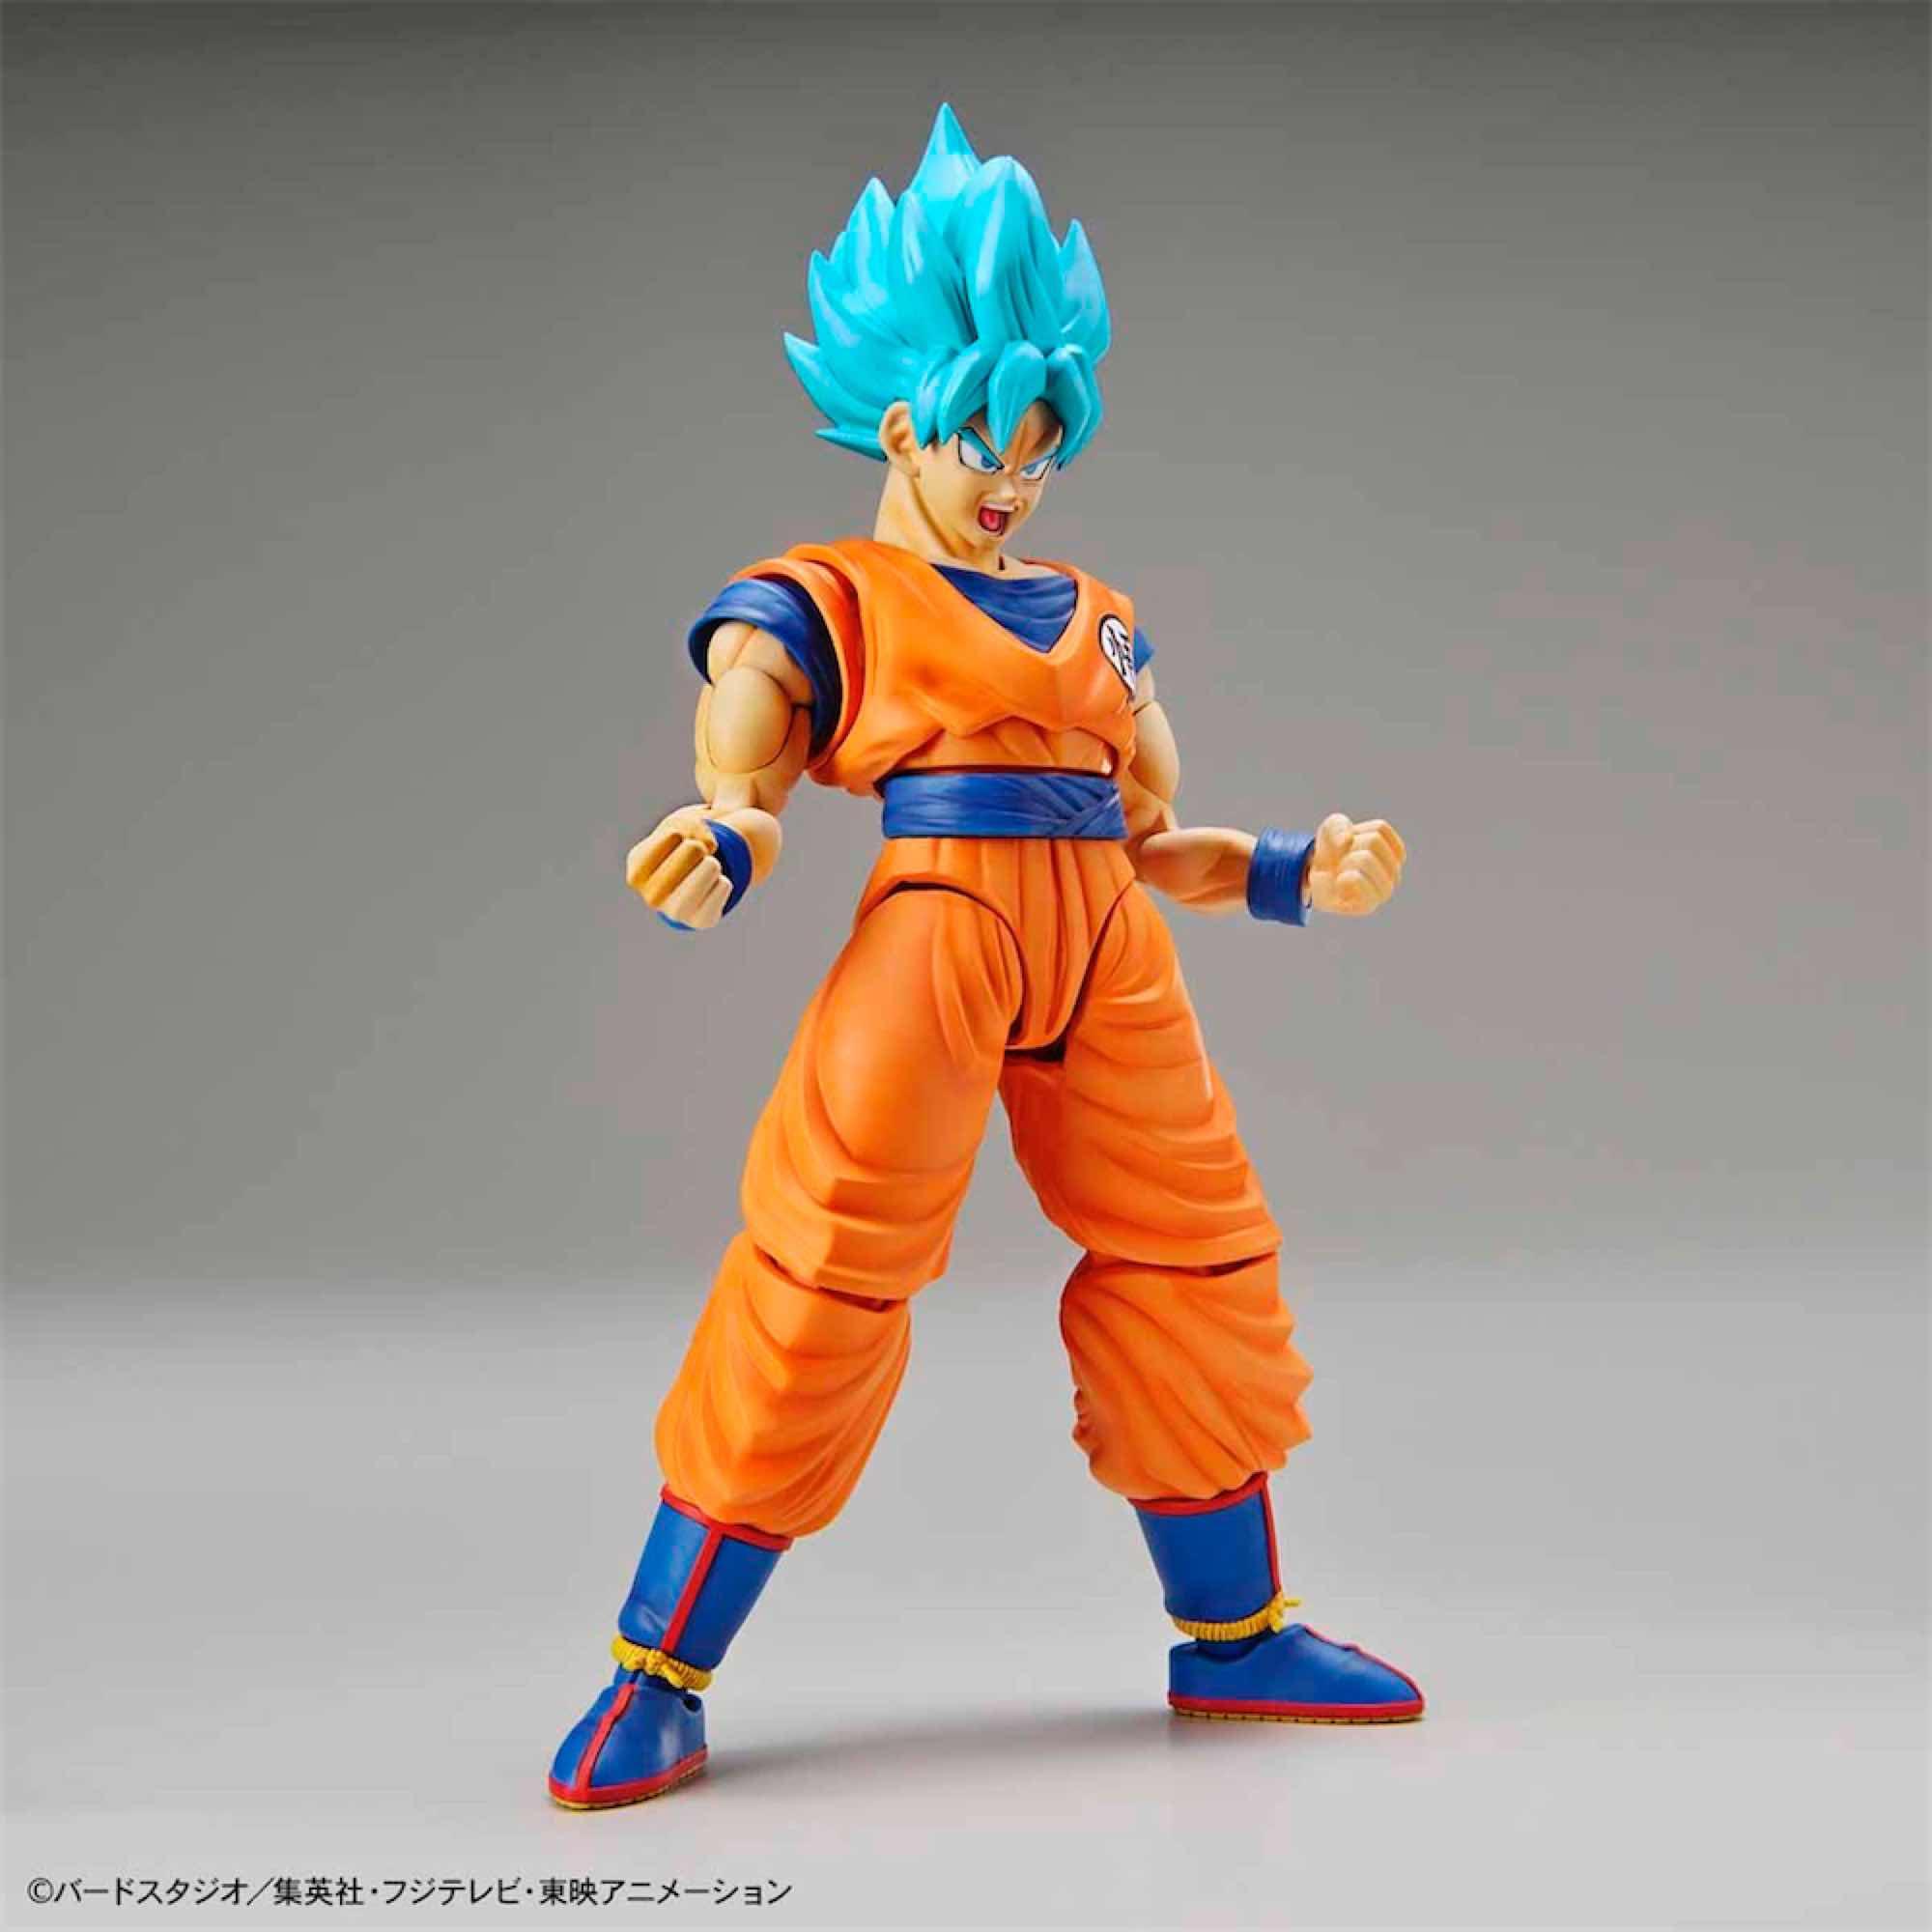 SON GOKU SUPER SAIYAN GOD BLUE MODEL KIT FIGURA 14 CM DRAGON BALL Z FIGURE-RISE STANDARD